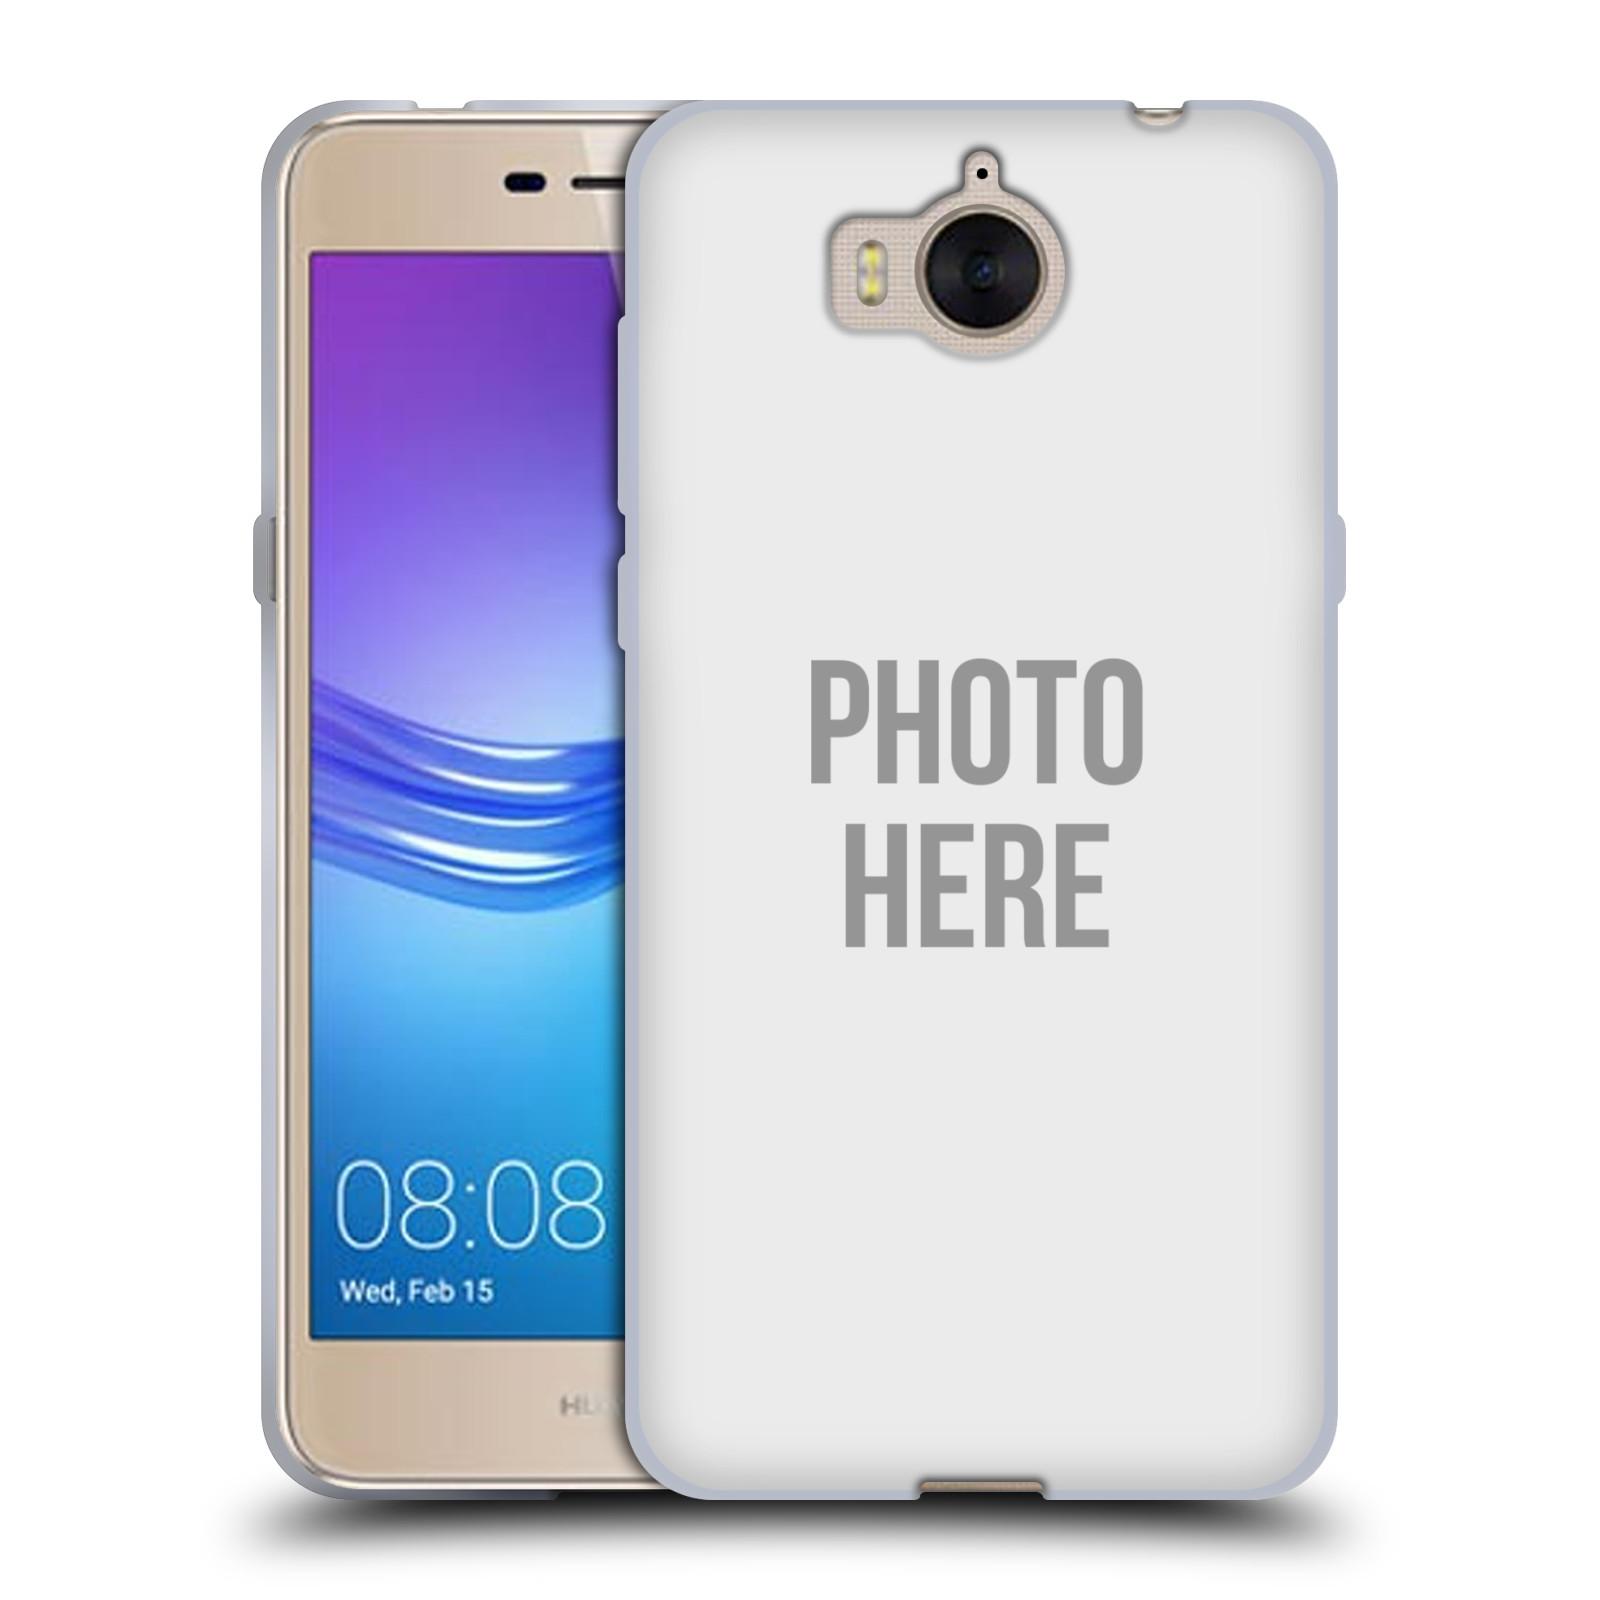 Silikonové pouzdro na mobil Huawei Y6 2017 - Head Case - s vlastním motivem